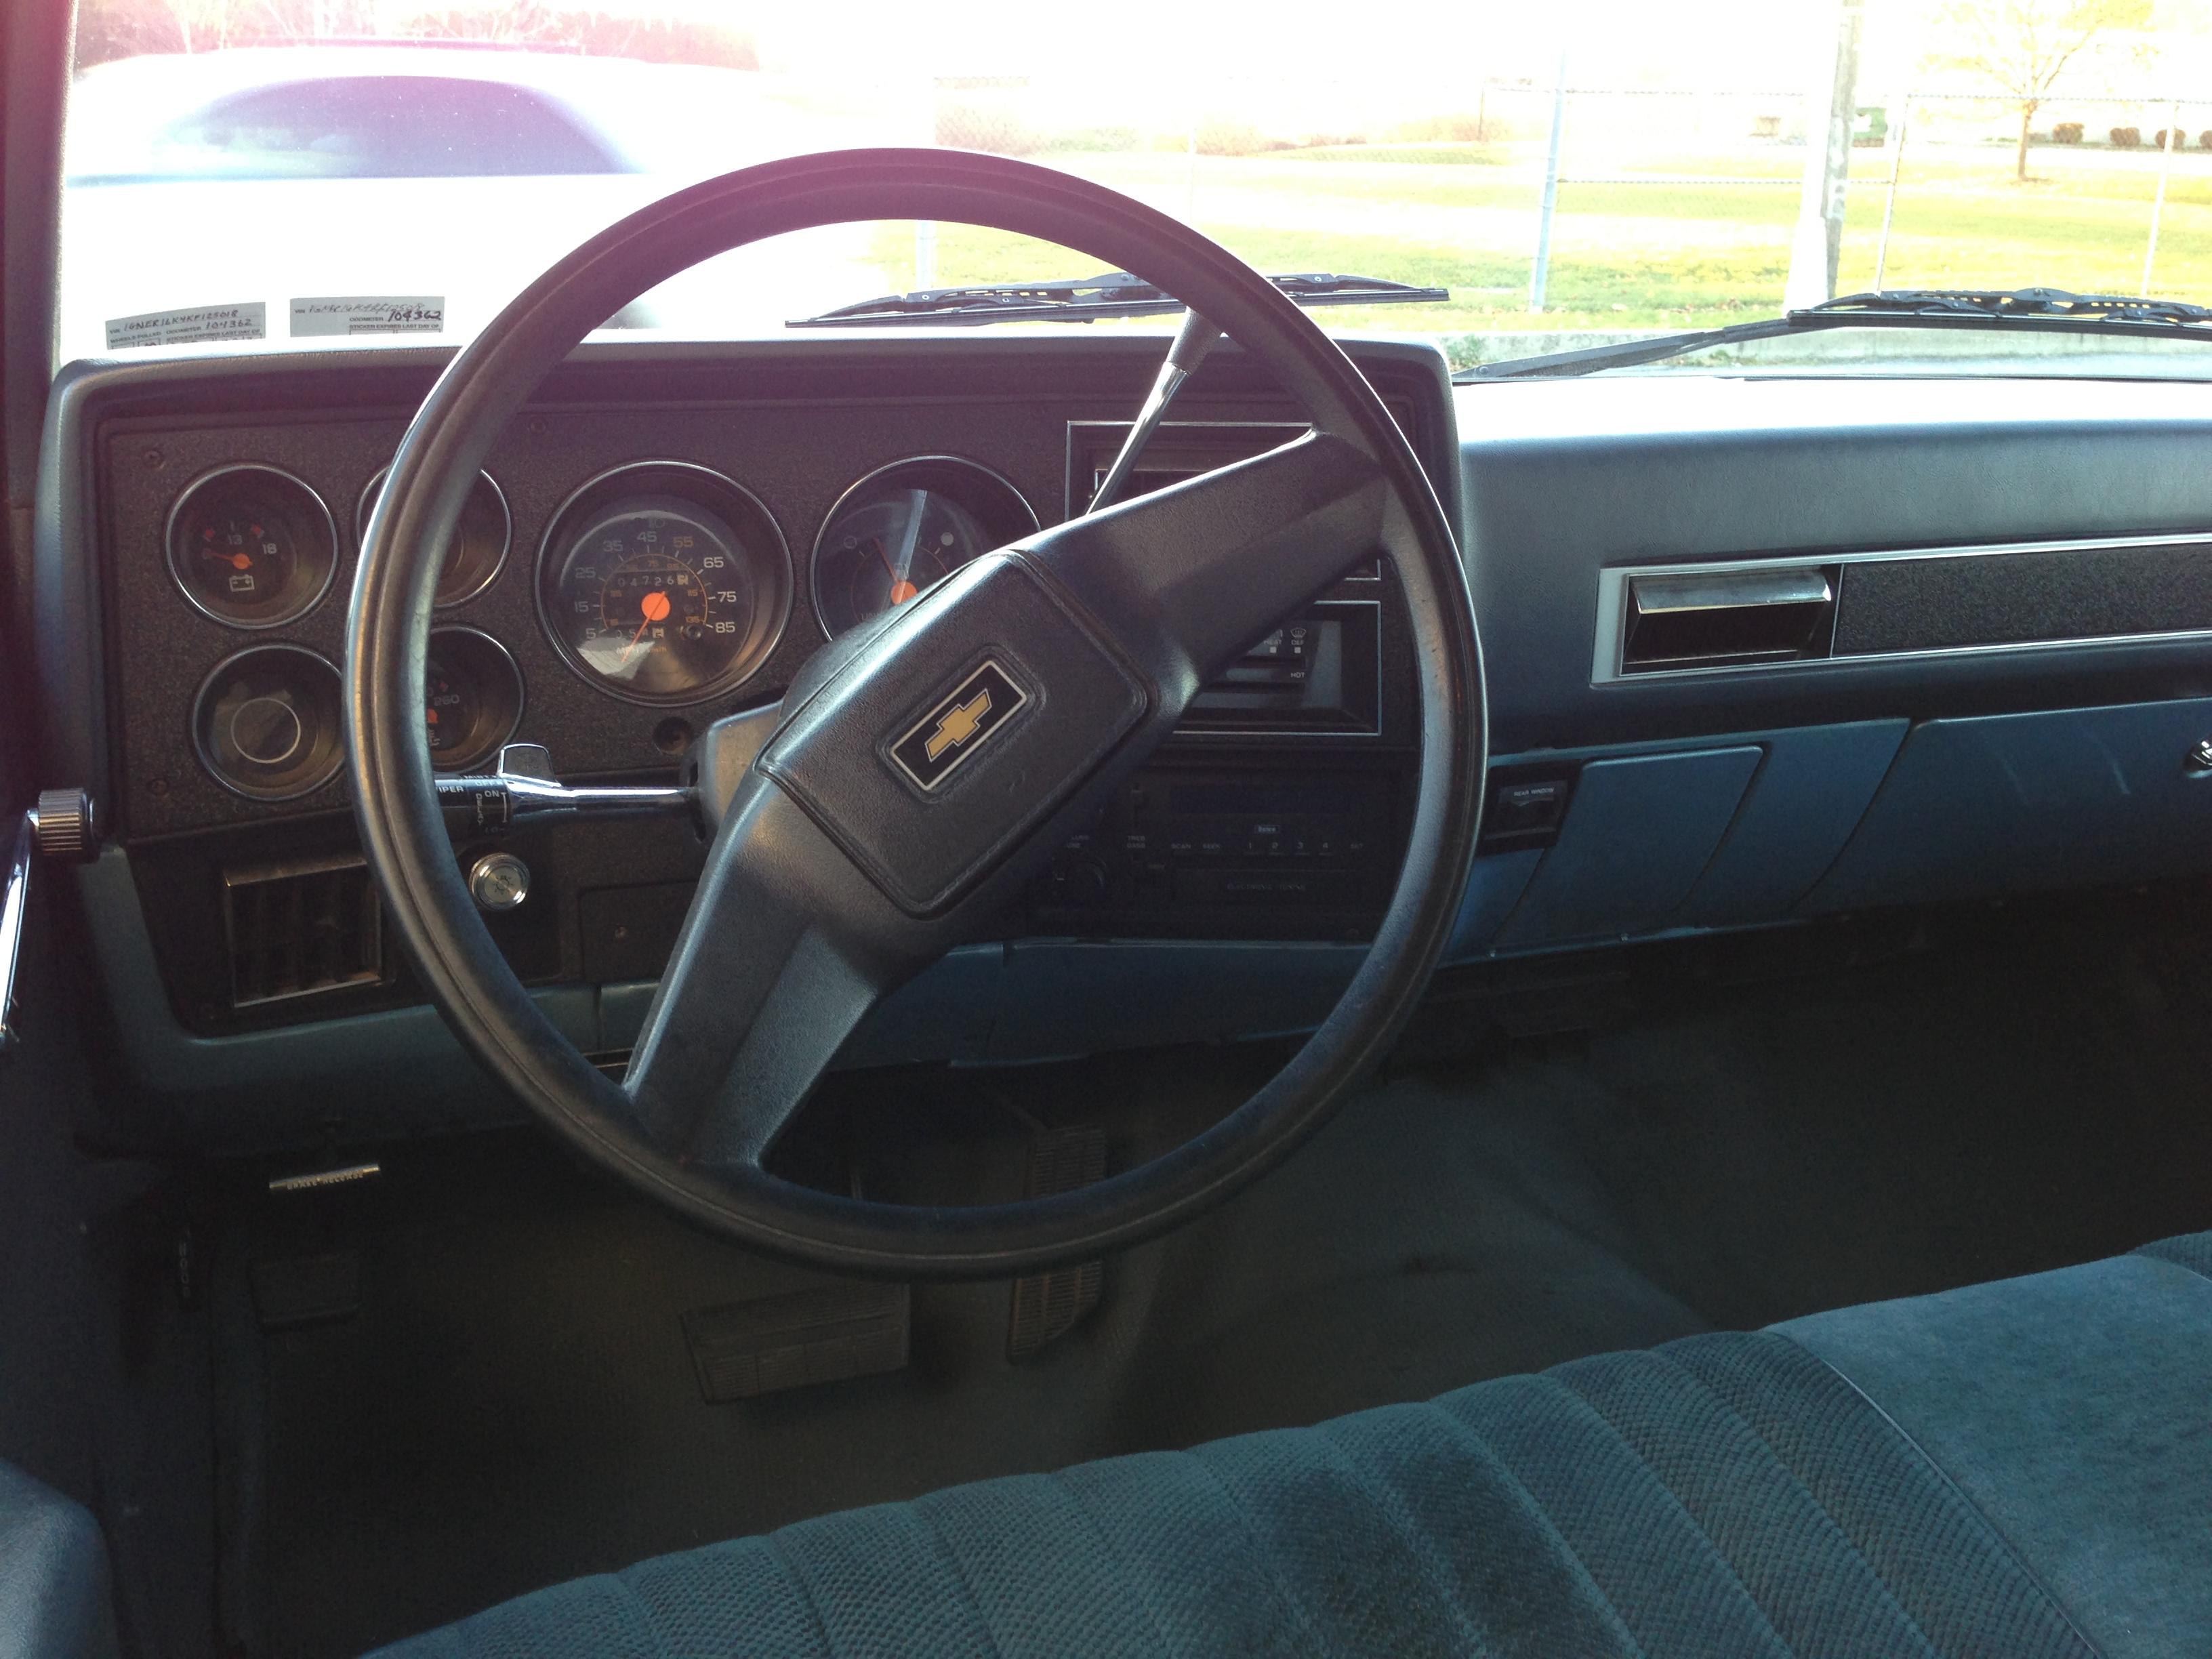 Capsule Review 1989 Chevrolet Suburban 1500 4x2